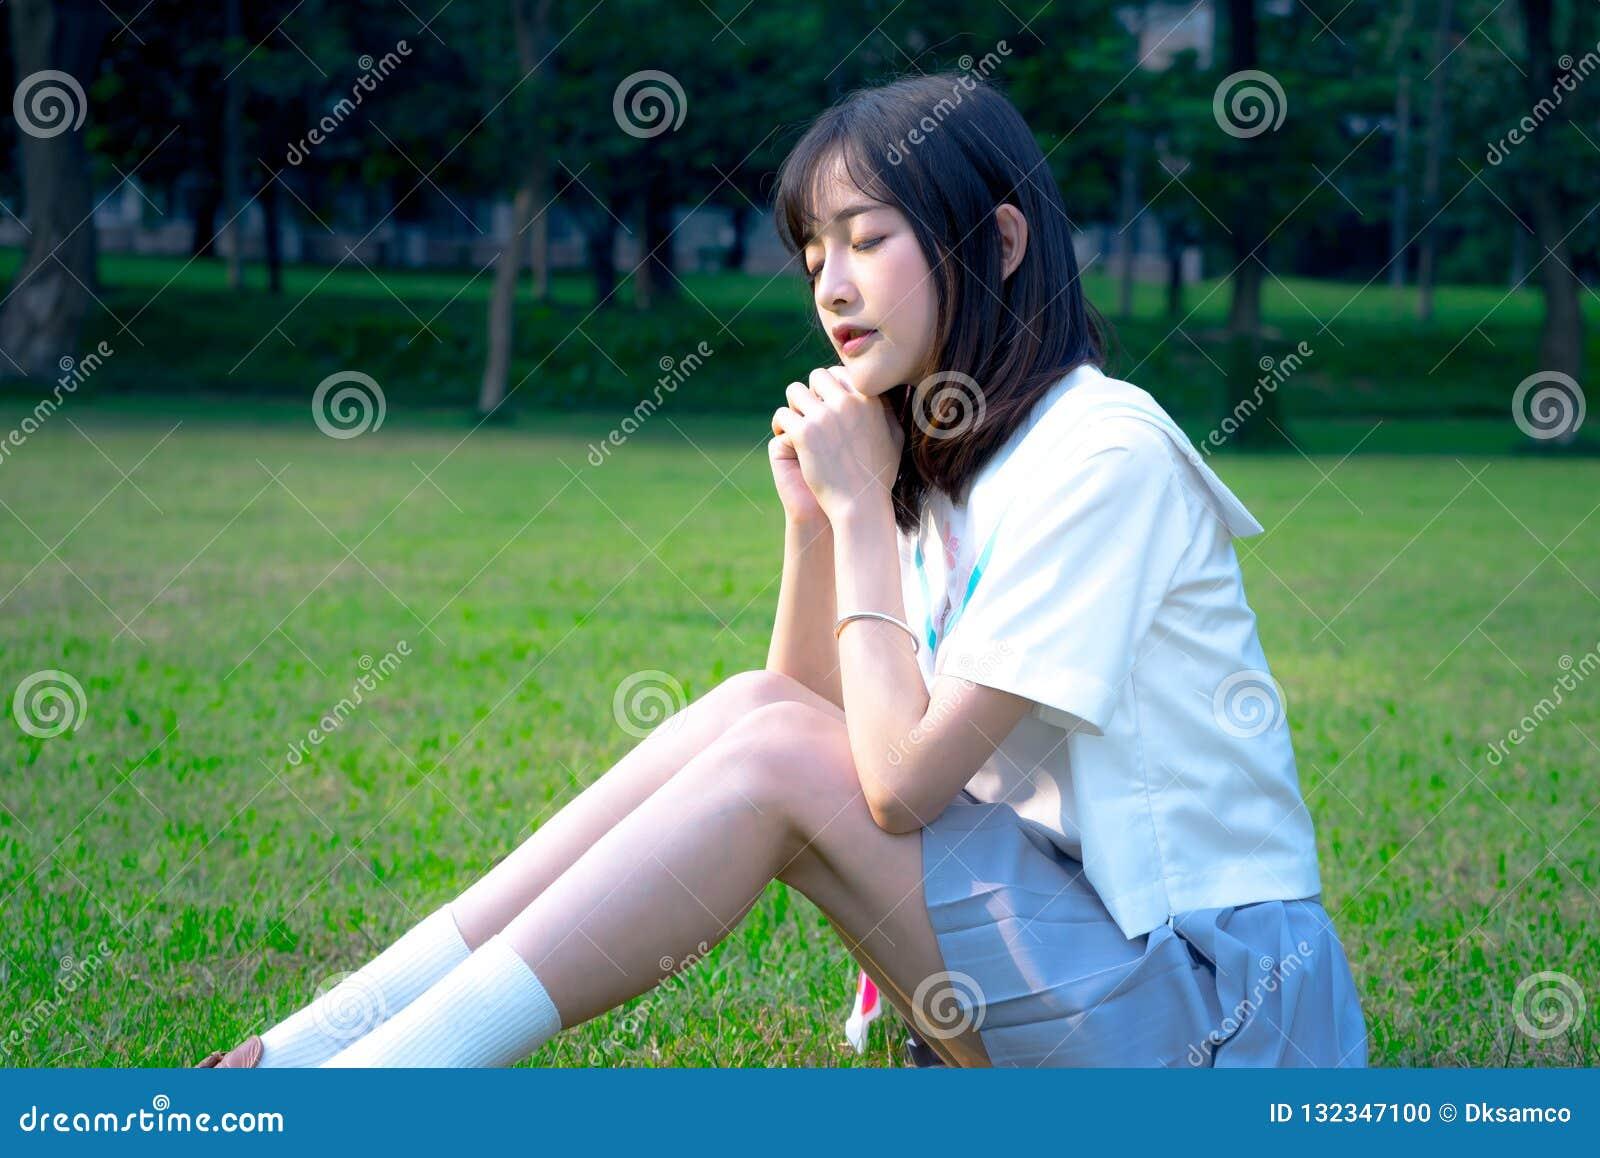 Outdoor asian club uniform